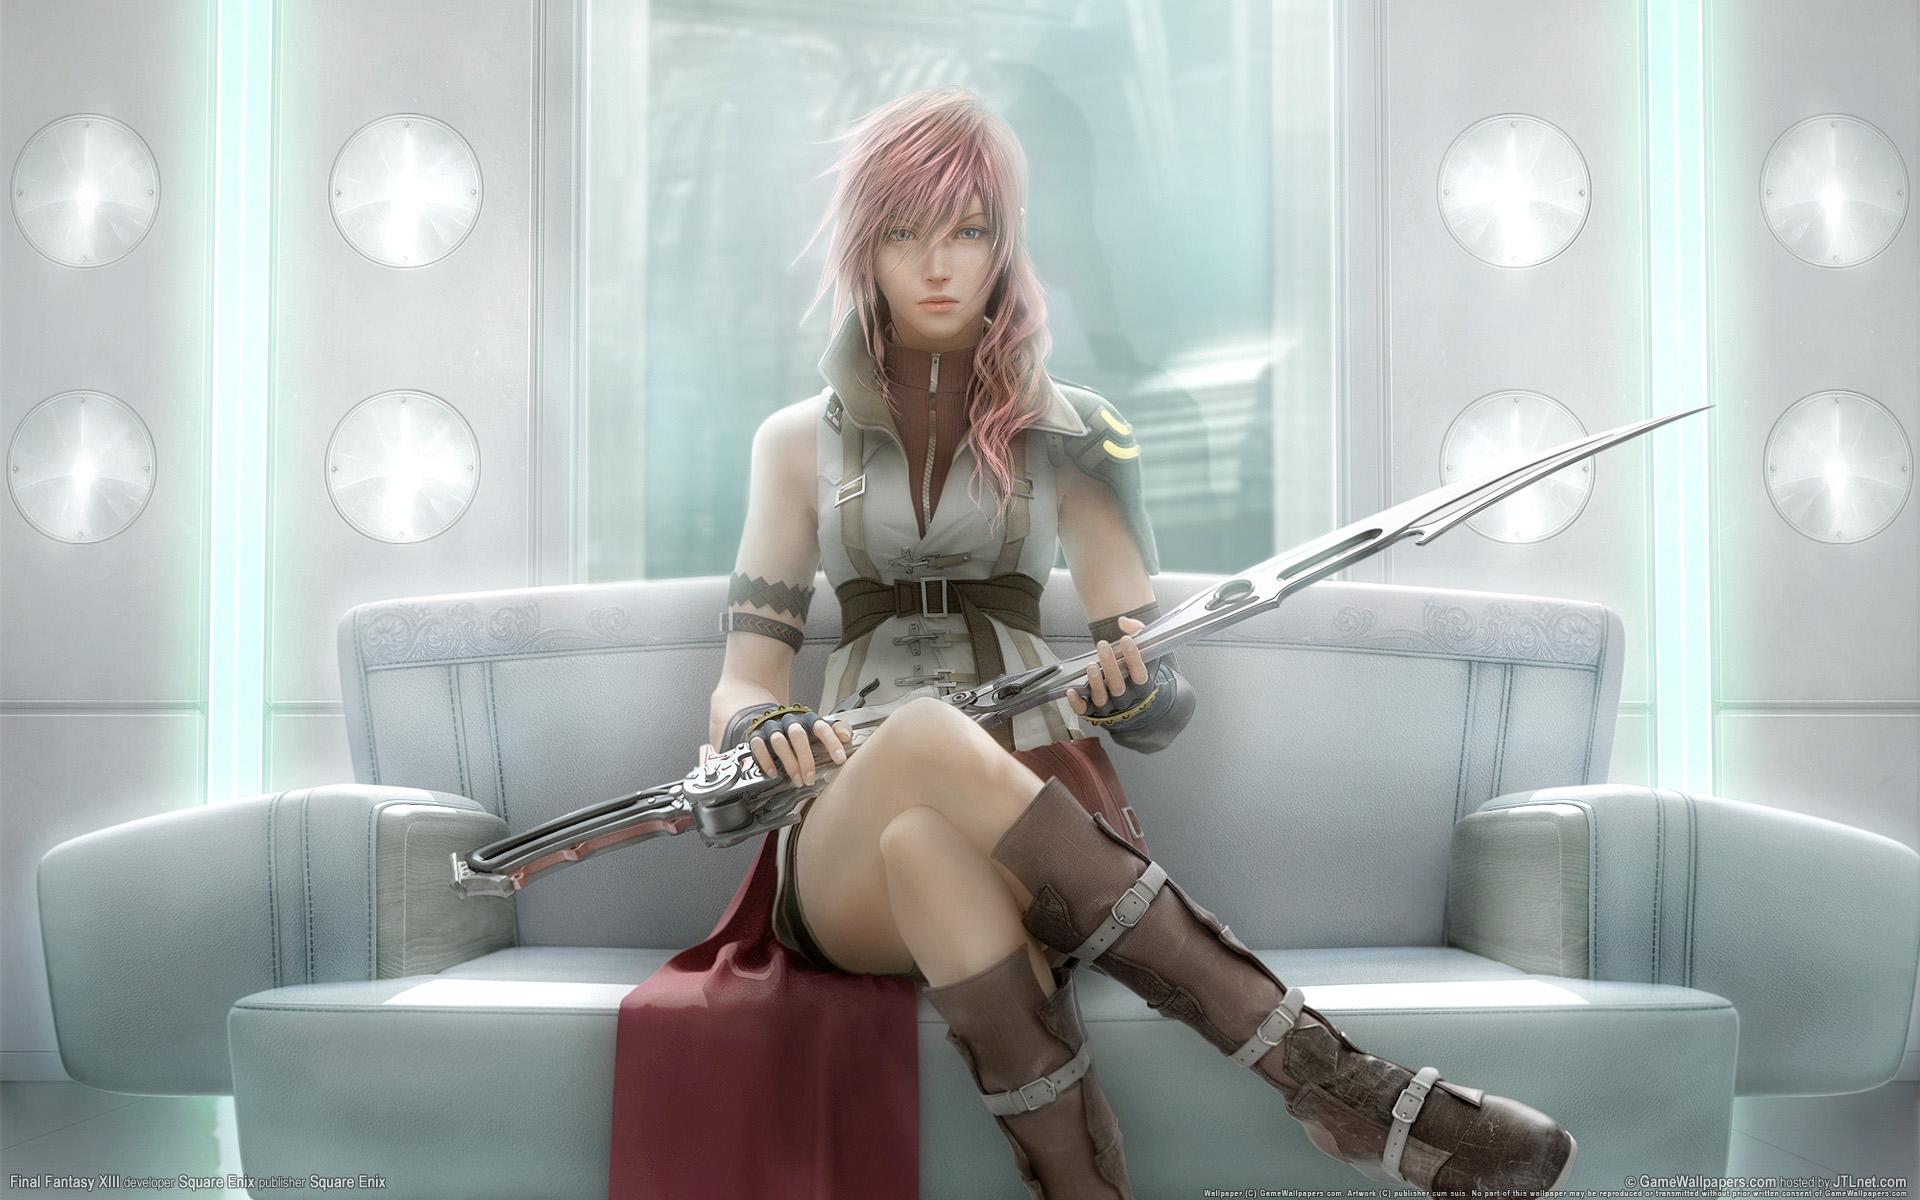 Final Fantasy Final Fantasy Xiii Lightning Farron Konachan Com Konachan Com Anime Wallpapers